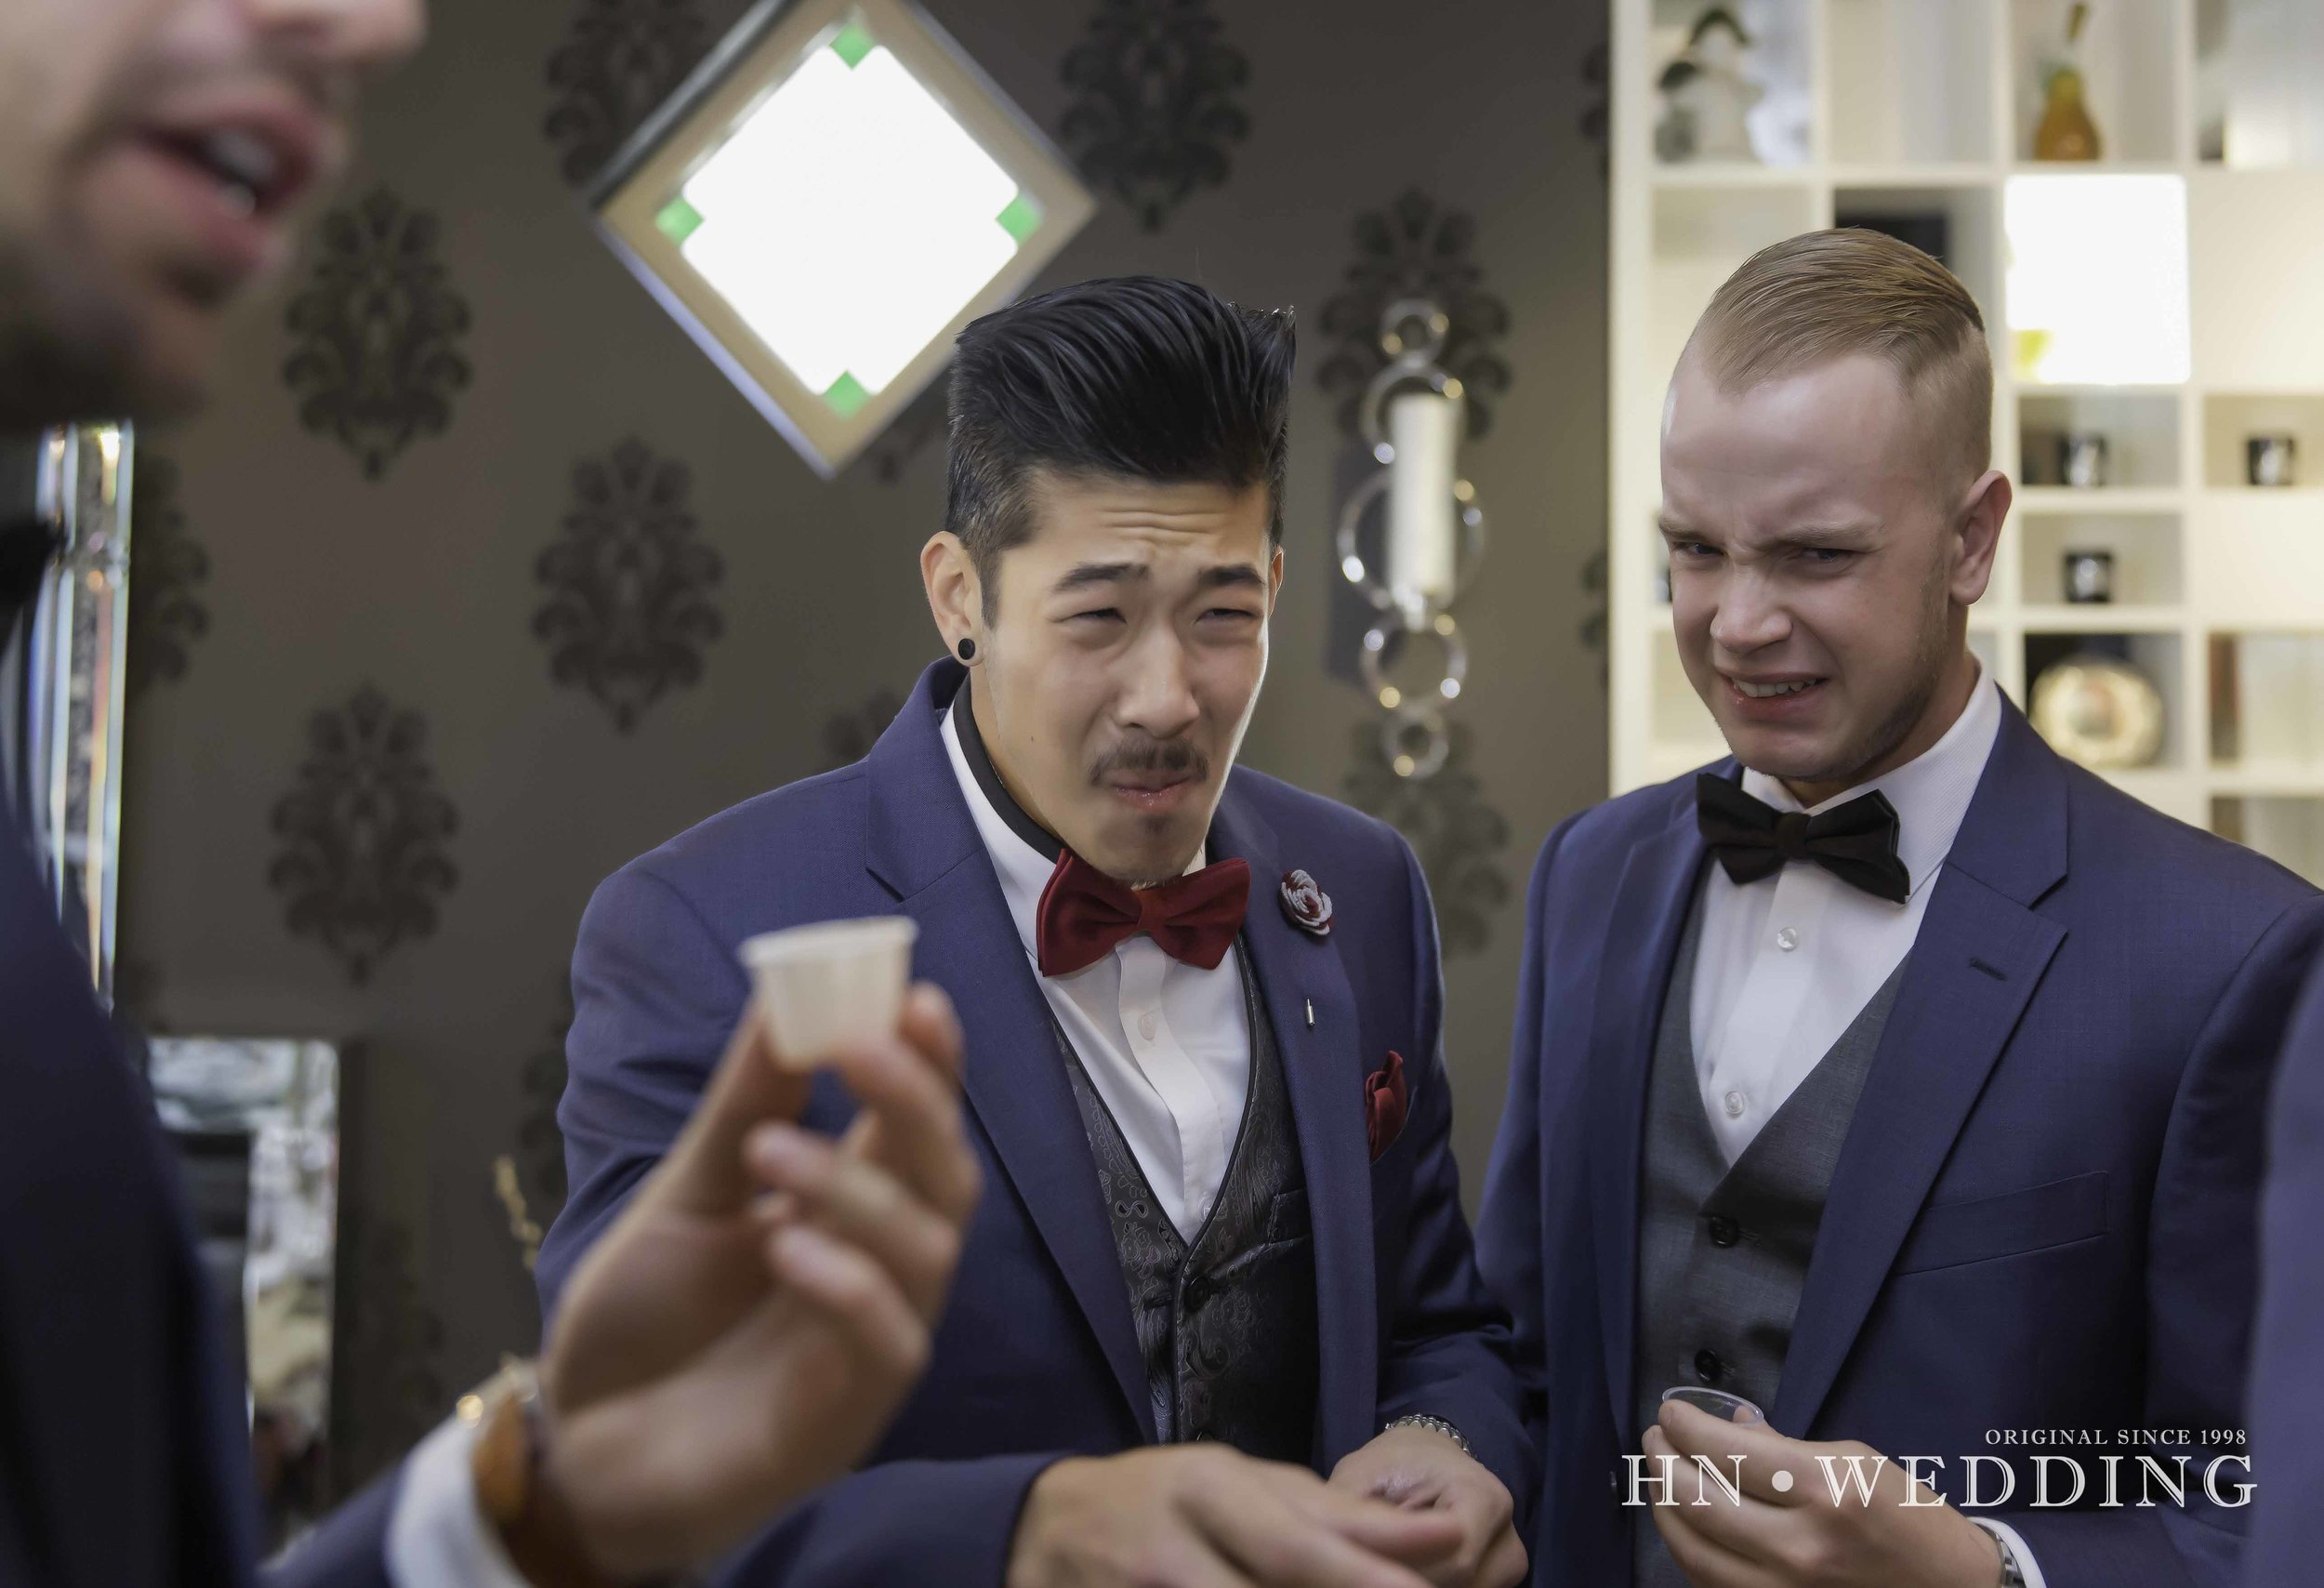 HNwedding-20160815-wedding-009.jpg